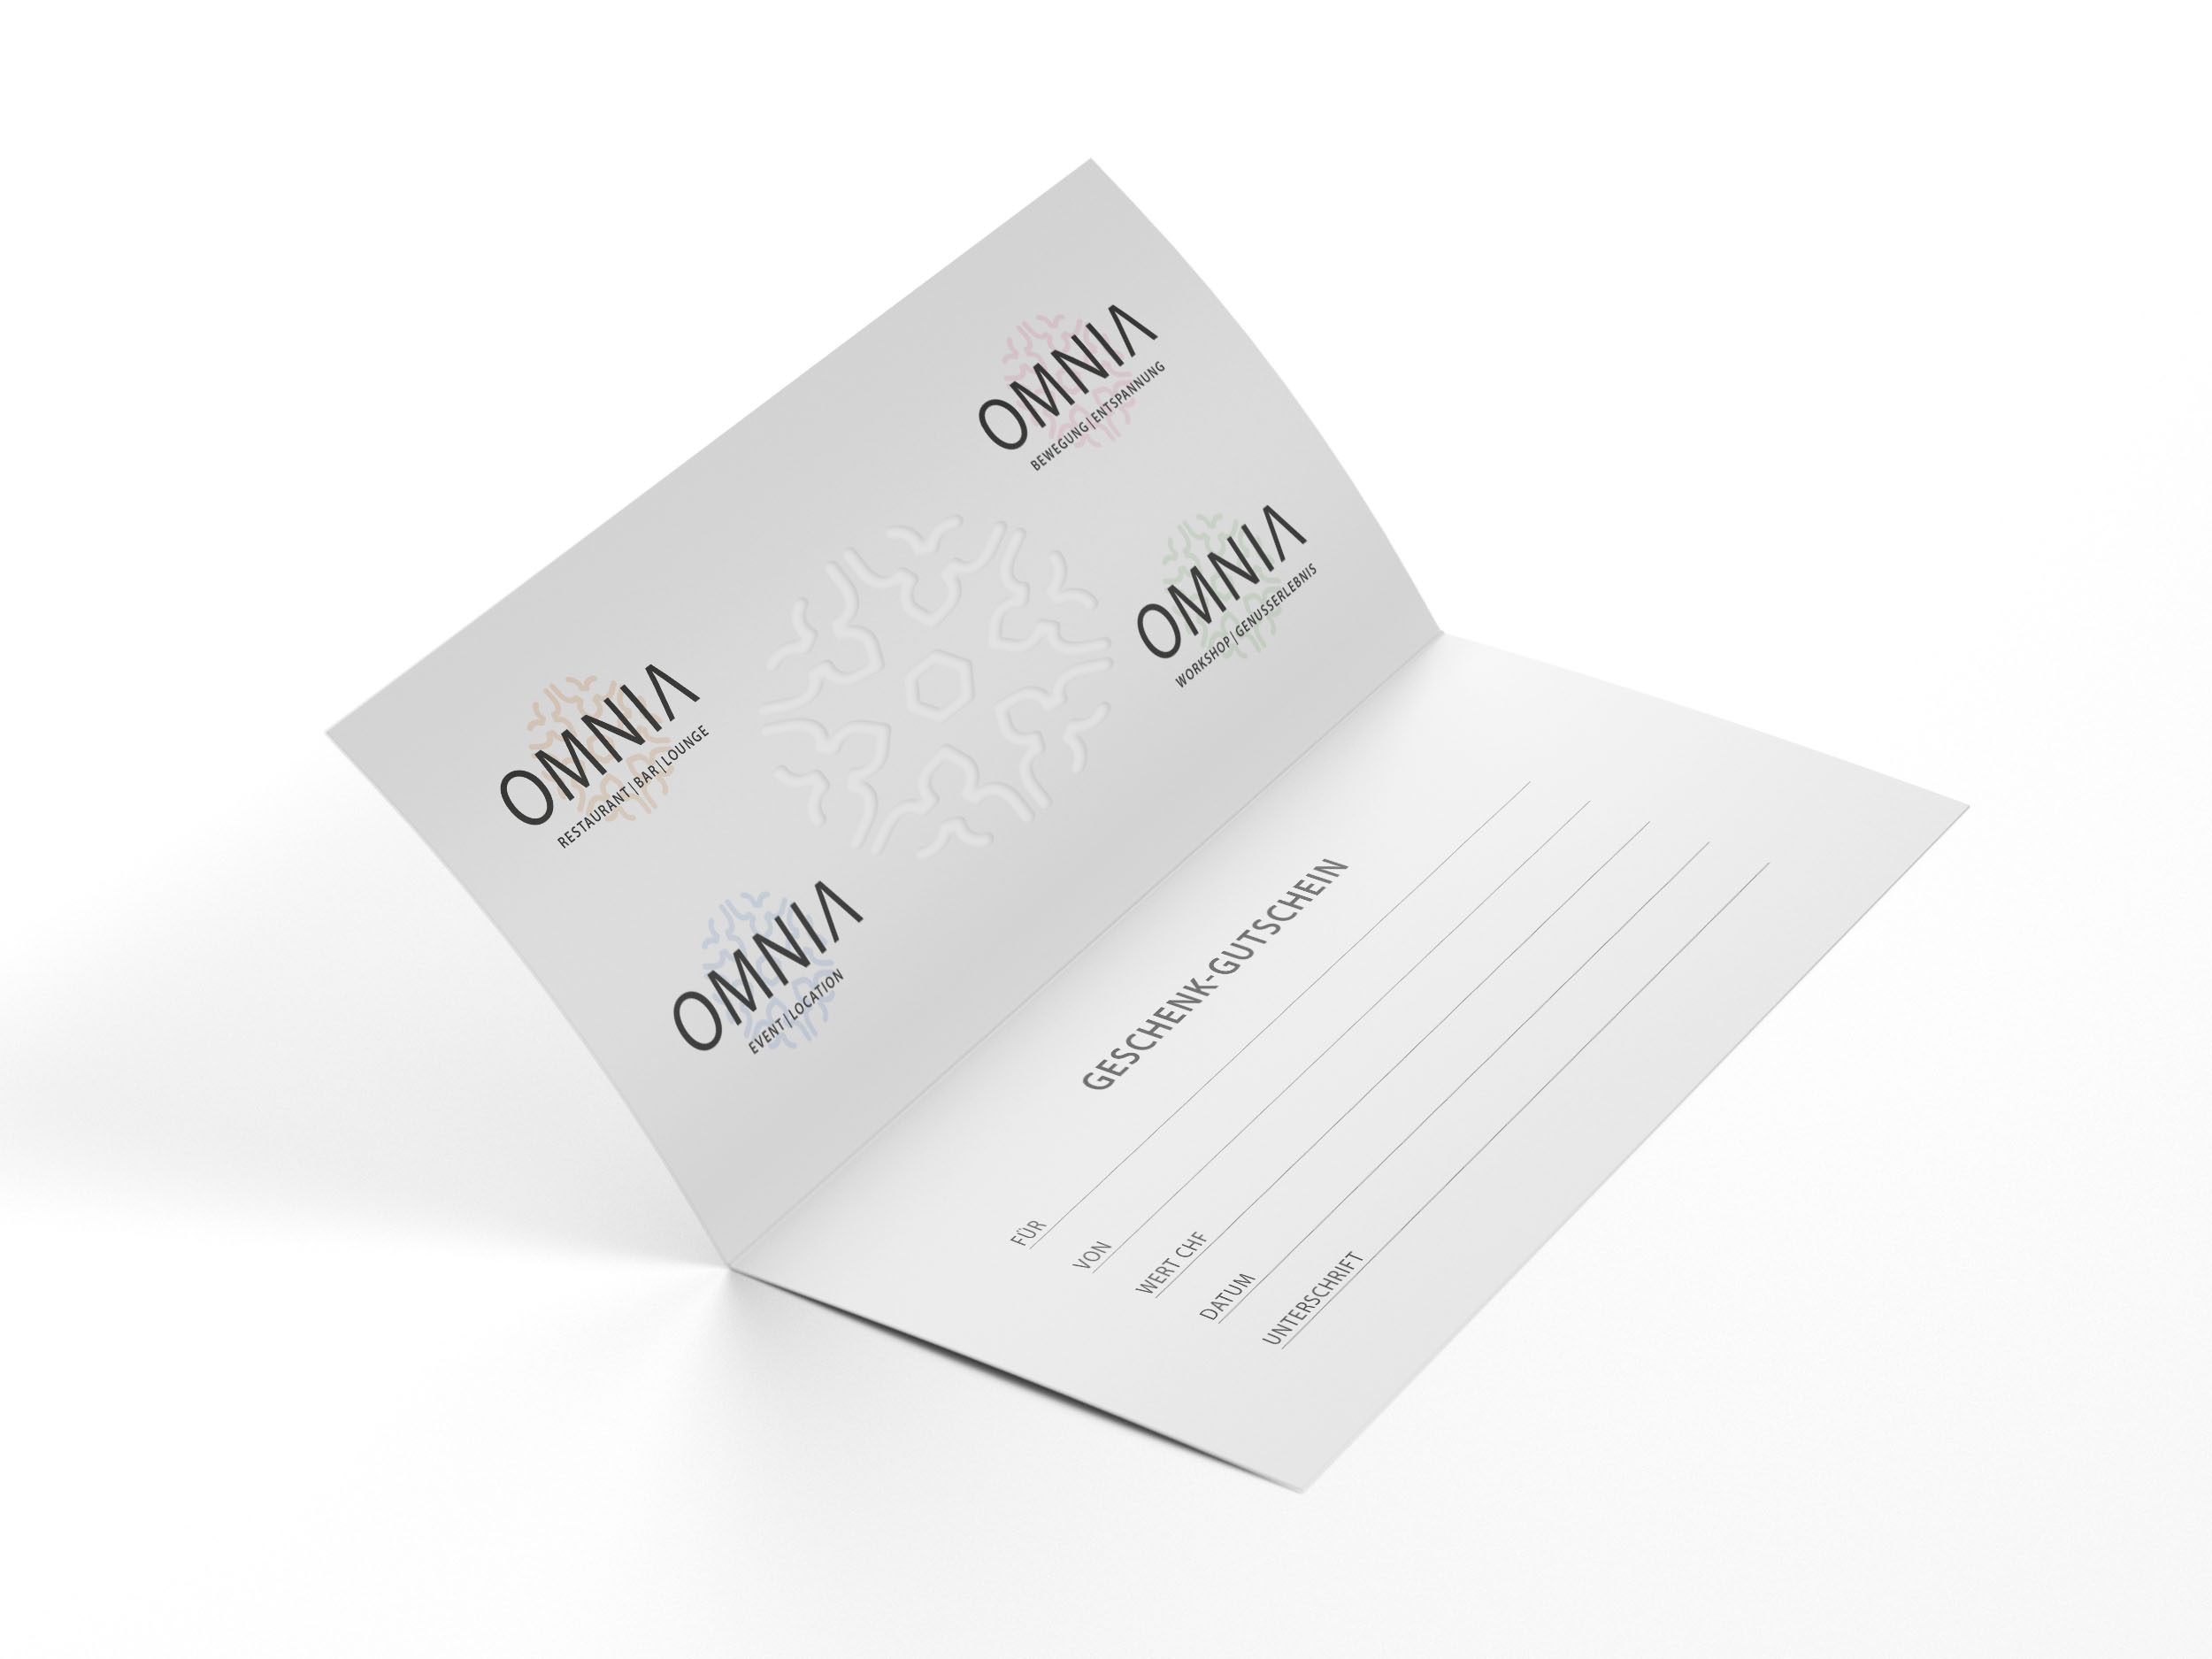 New Media & Design Omnia